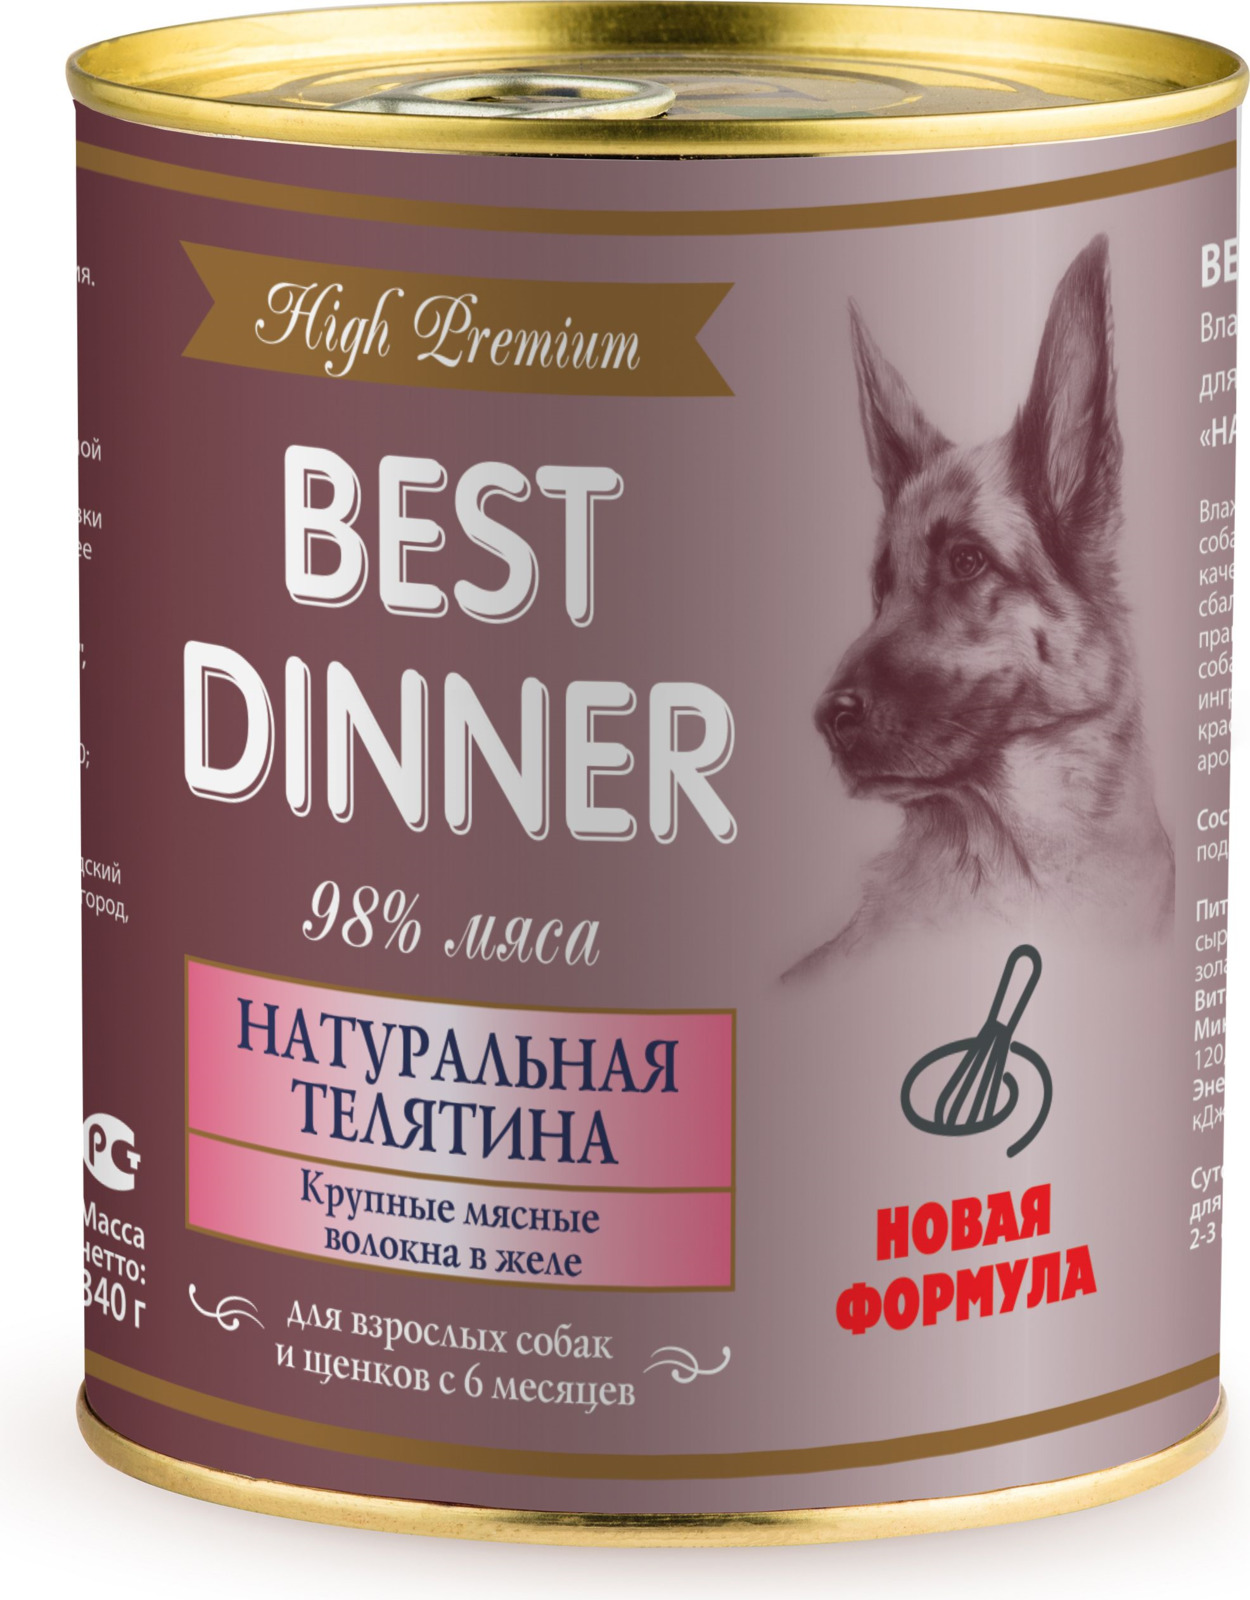 Корм консервированный для собак Best Dinner High Premium, натуральная телятина, 340 г